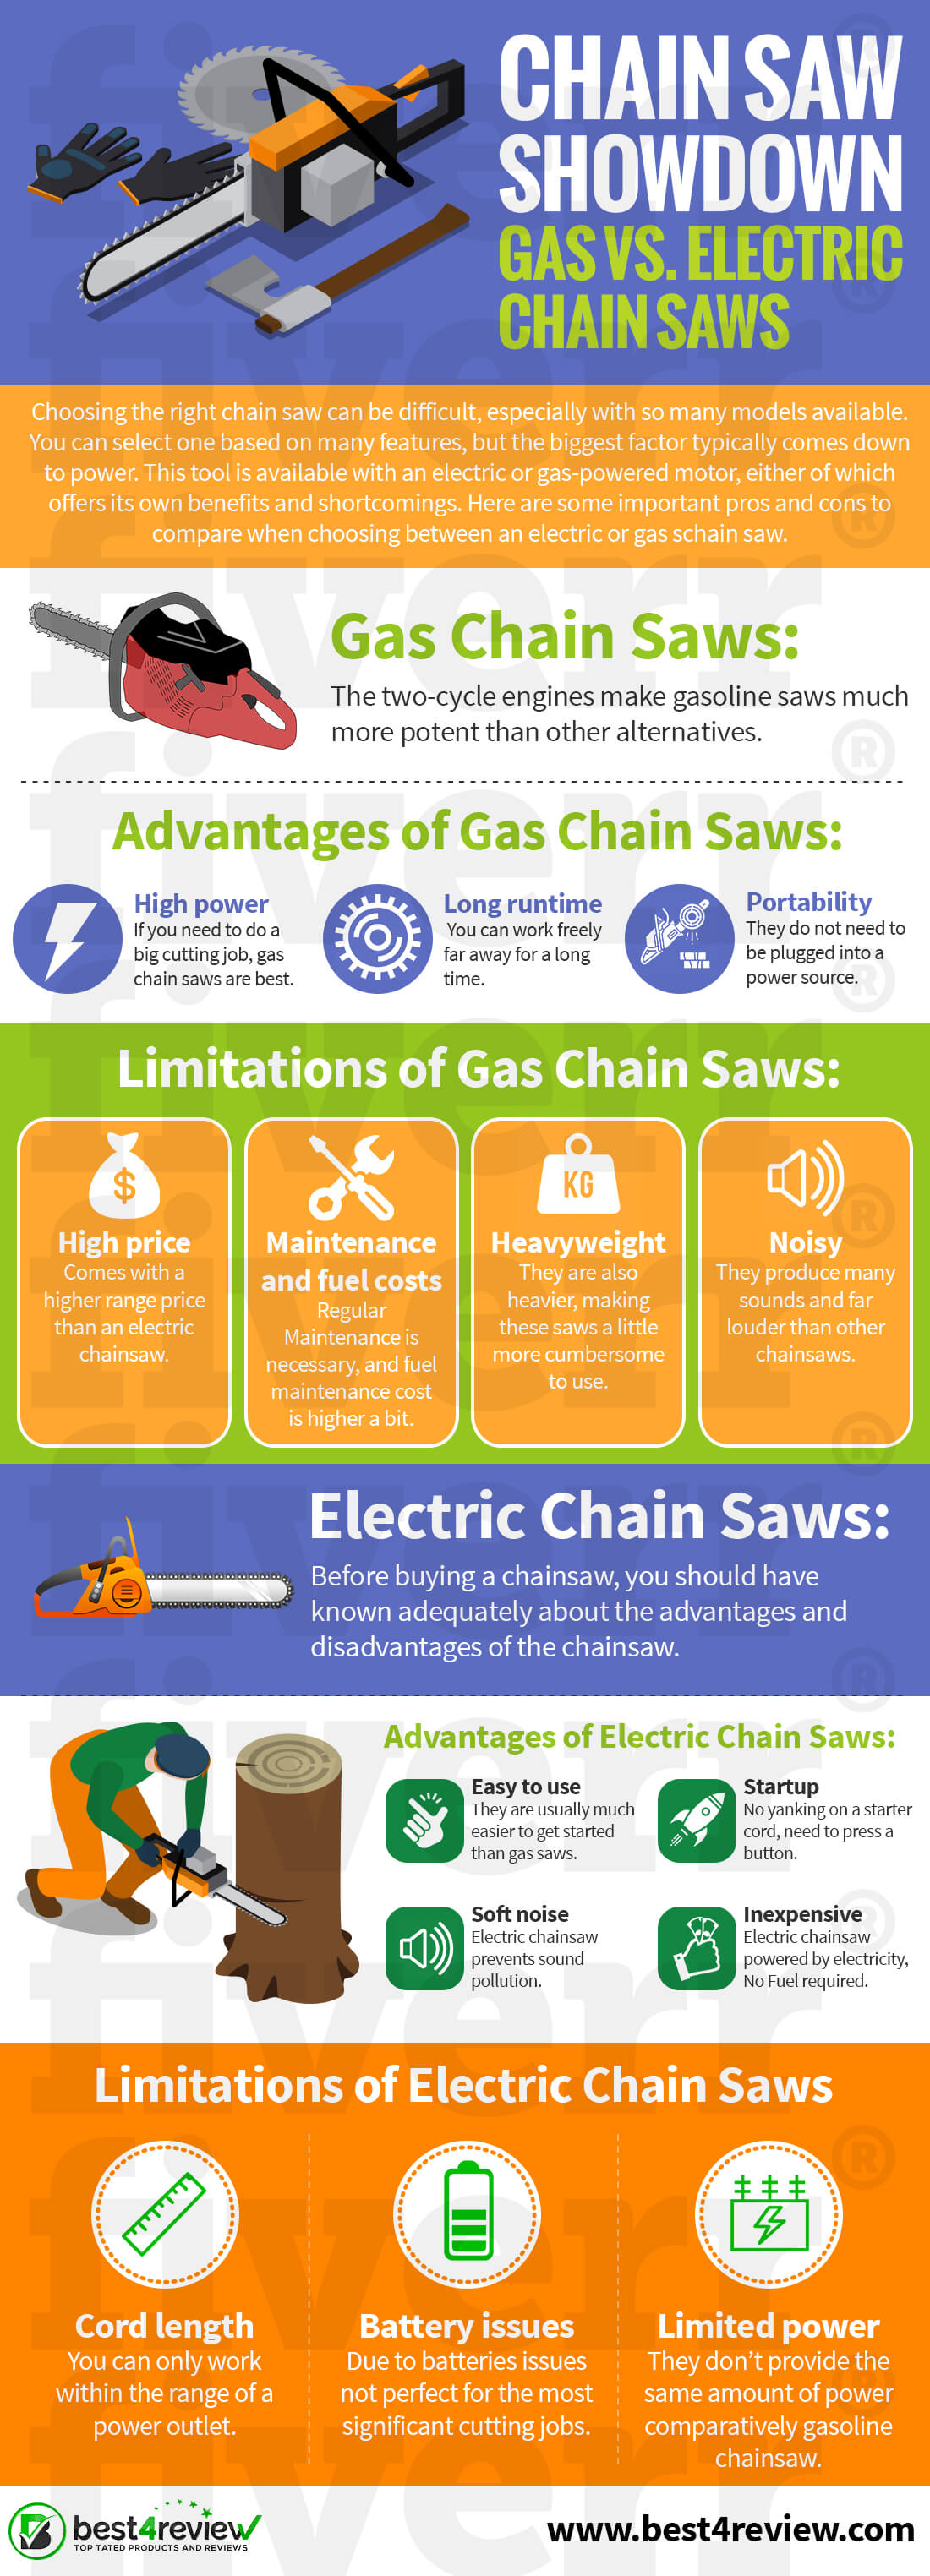 Gas vs. Electric Chain Saws